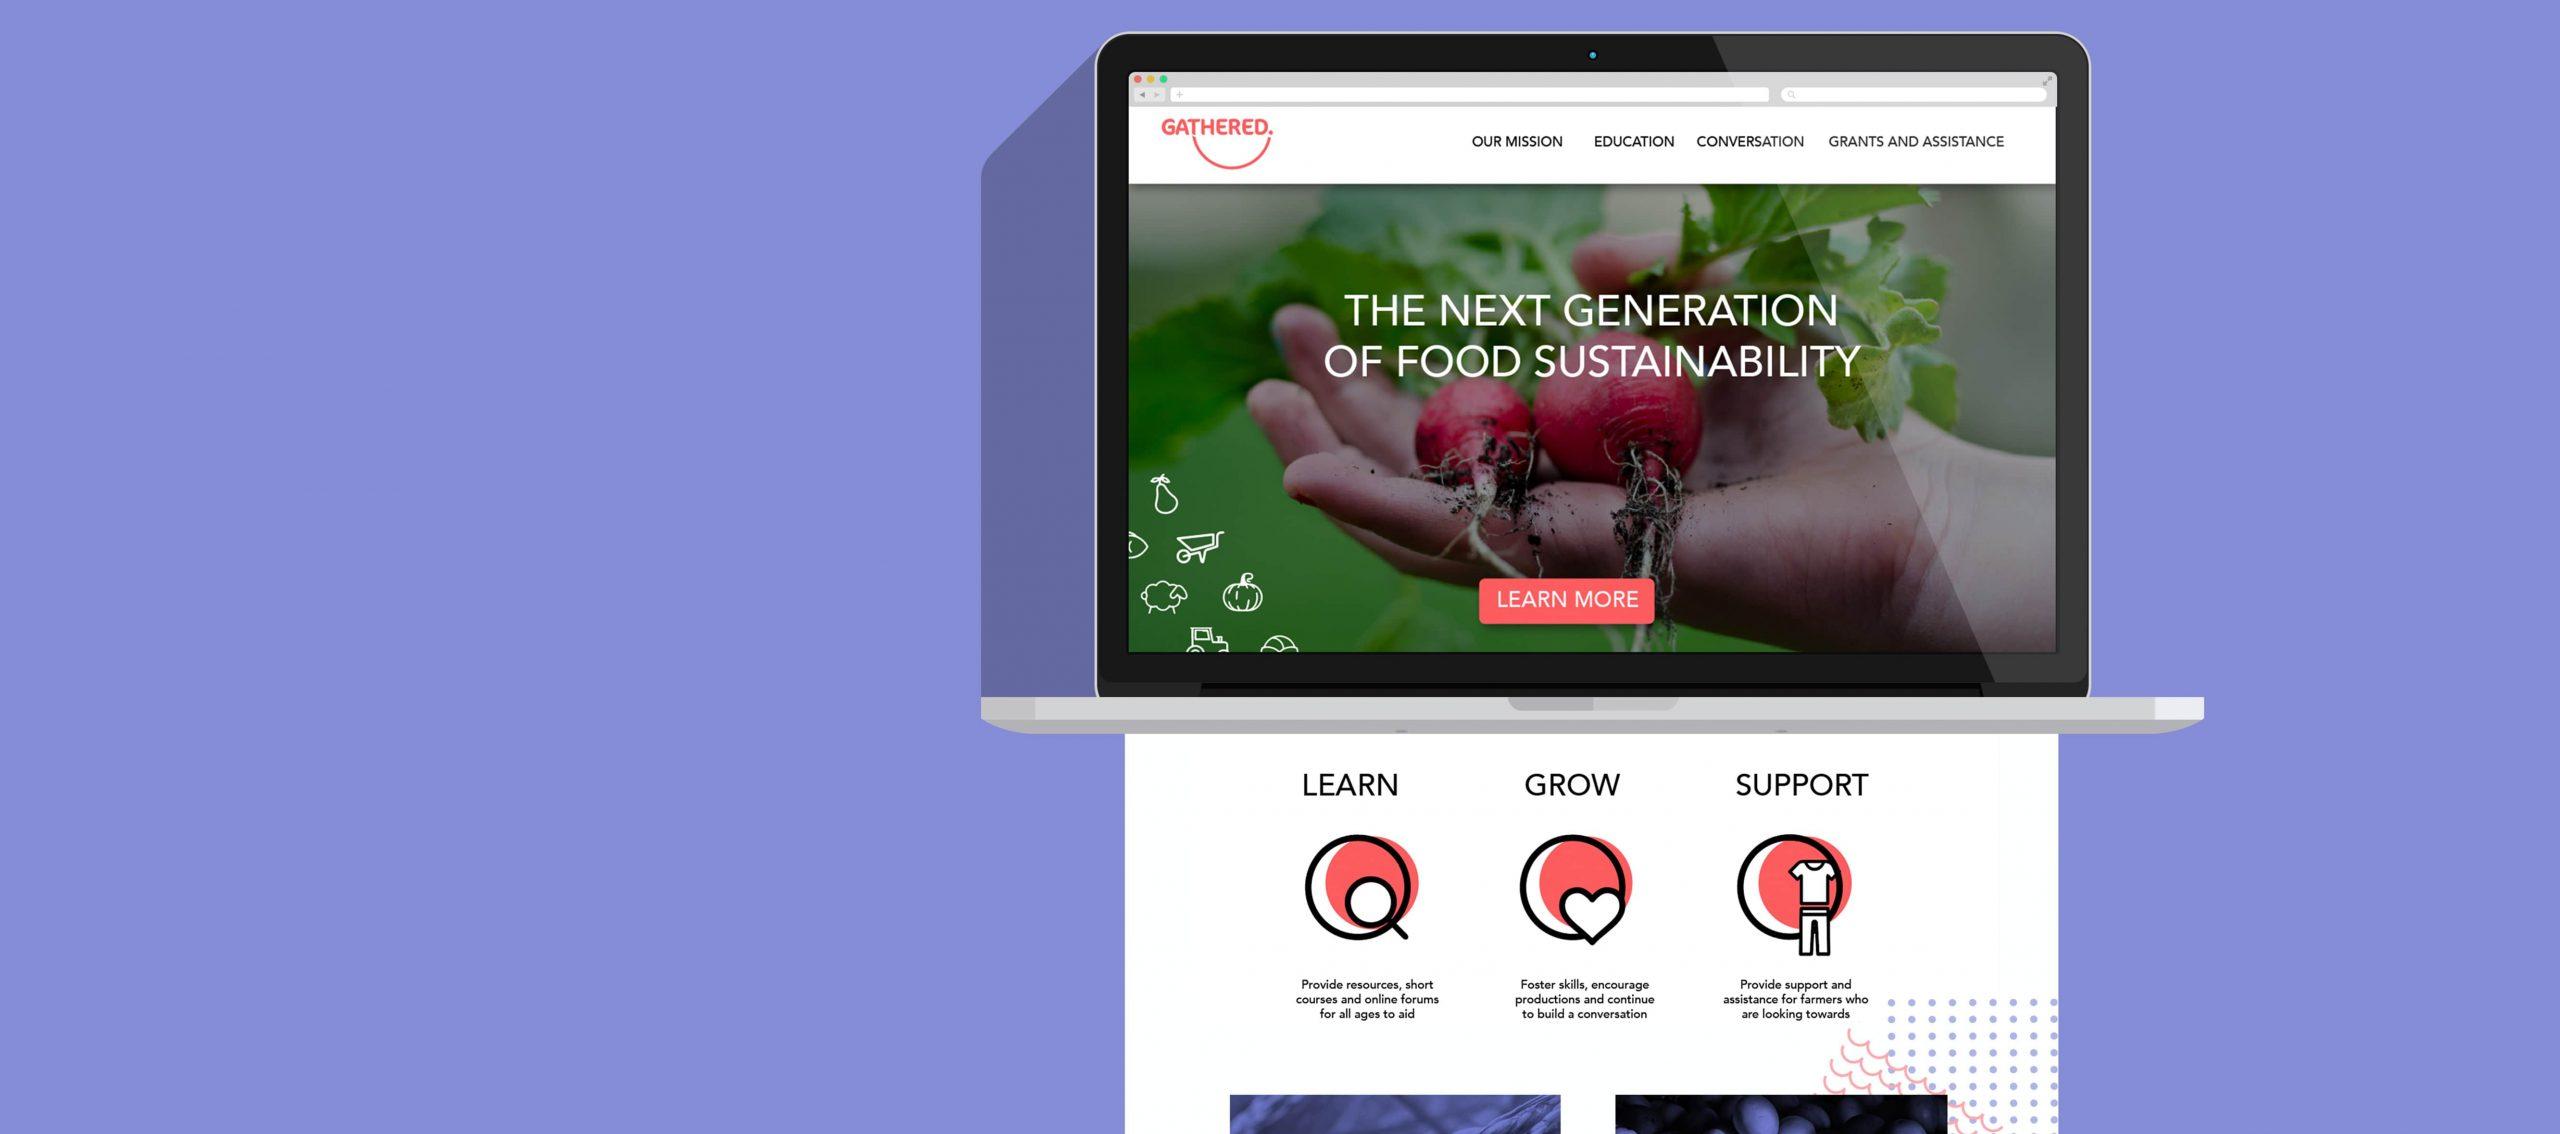 Gathered Website Landing Page